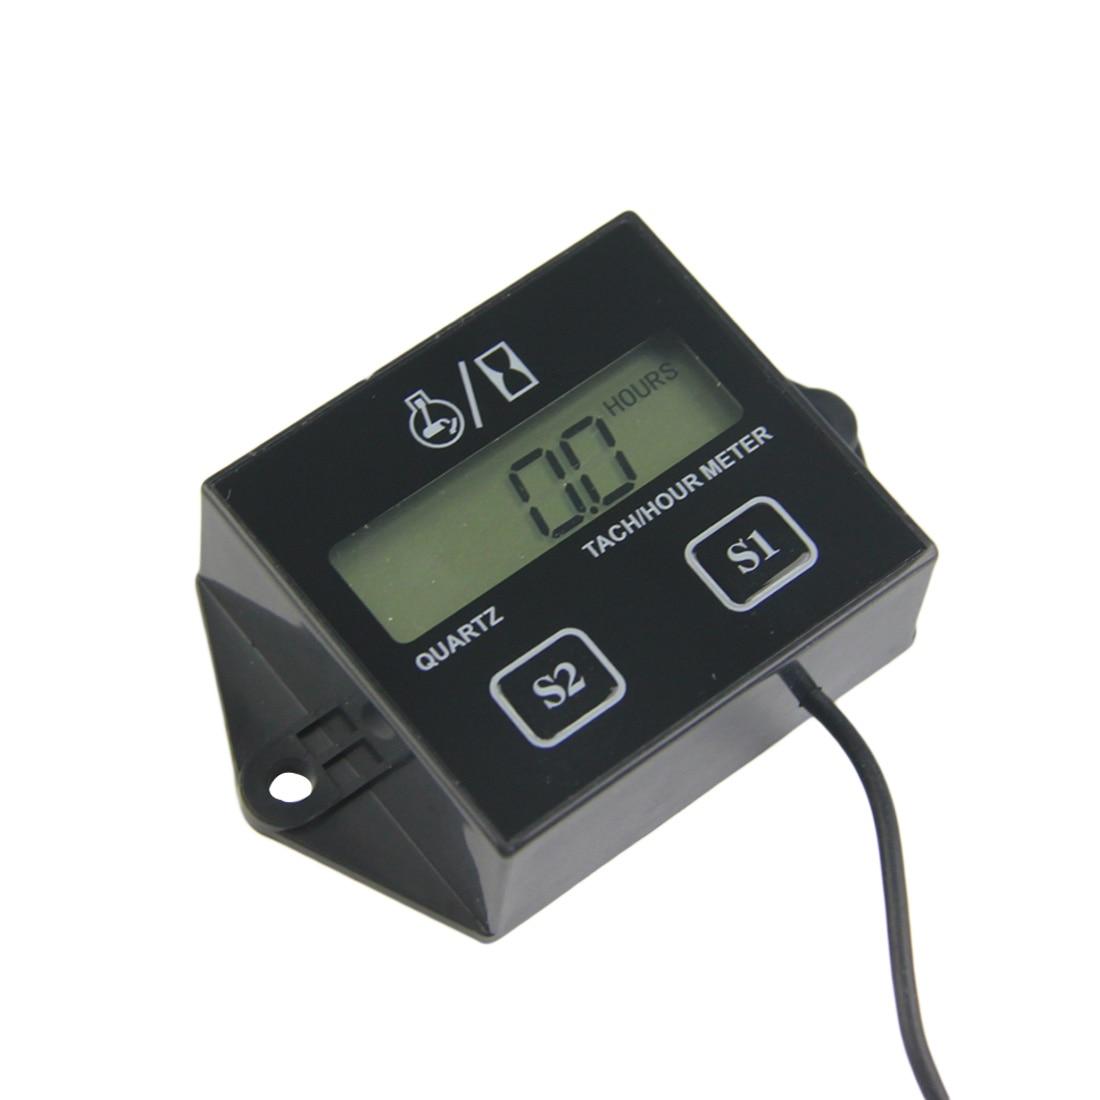 Motor Funken Tech Stunde Meter Digital Motor Tachometer Gauge Induktive Für Motorrad Motor Hub